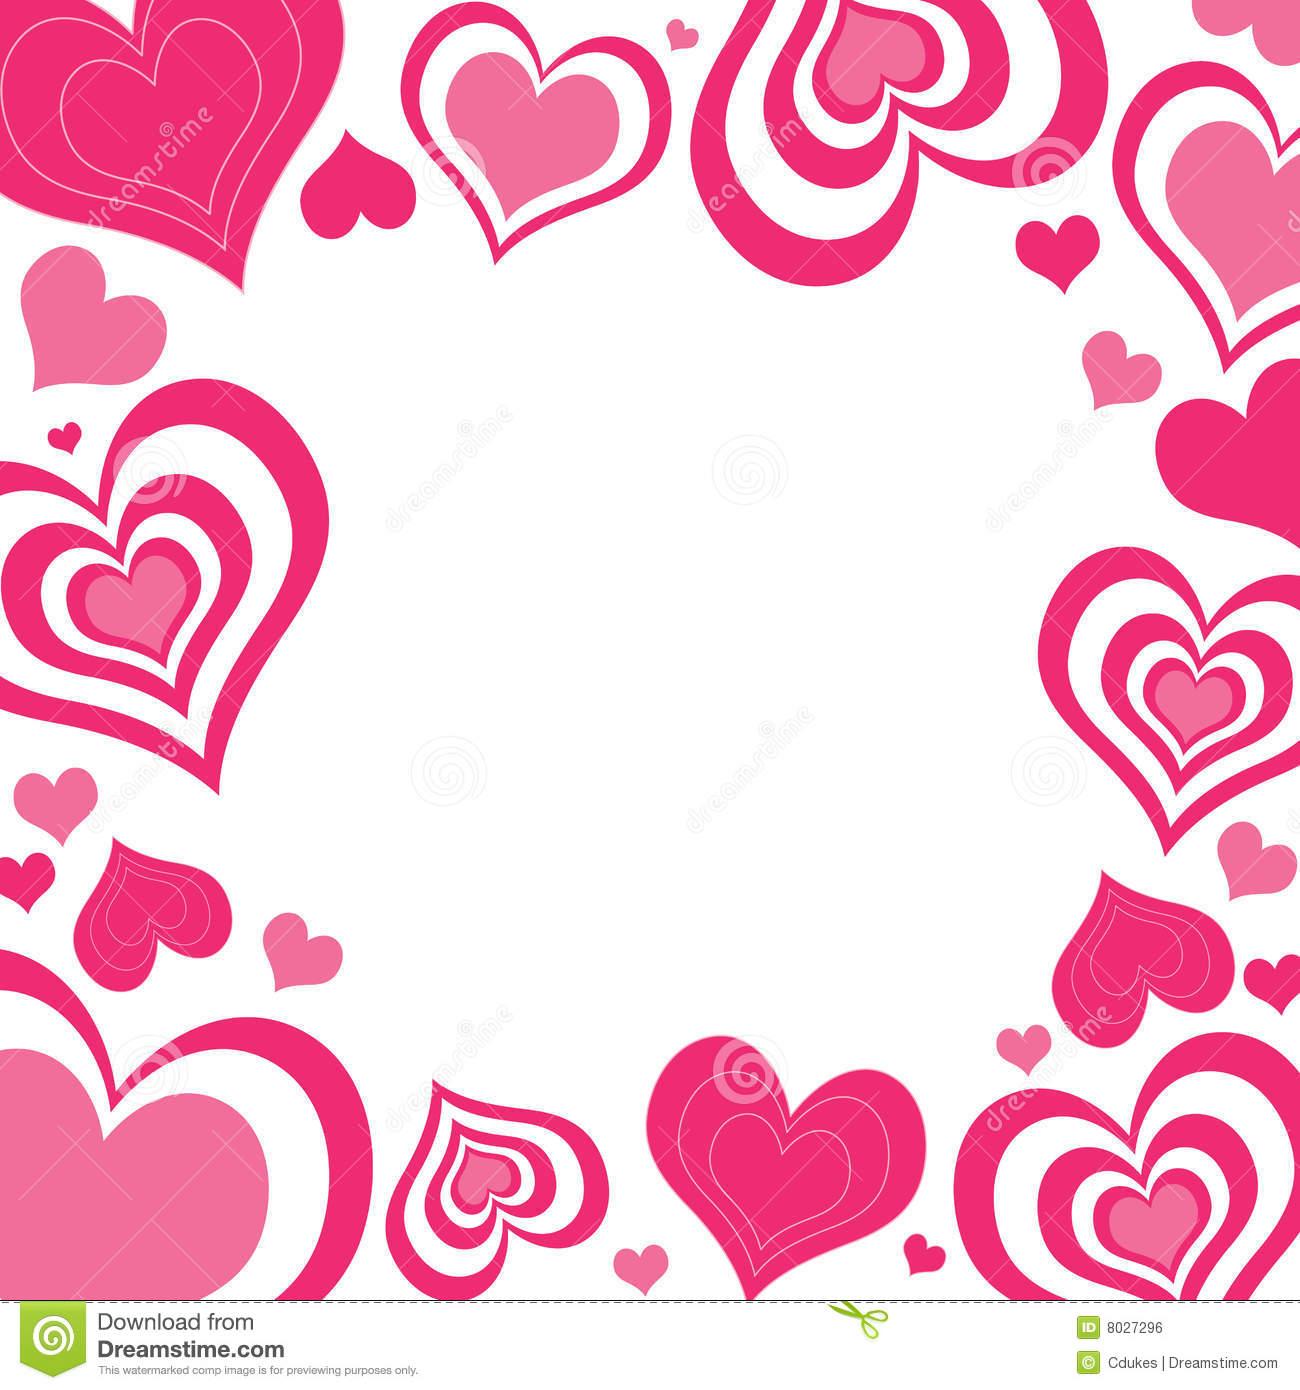 1300x1390 Valentine Hearts Border Clip Art Quotes Amp Wishes For Valentine'S